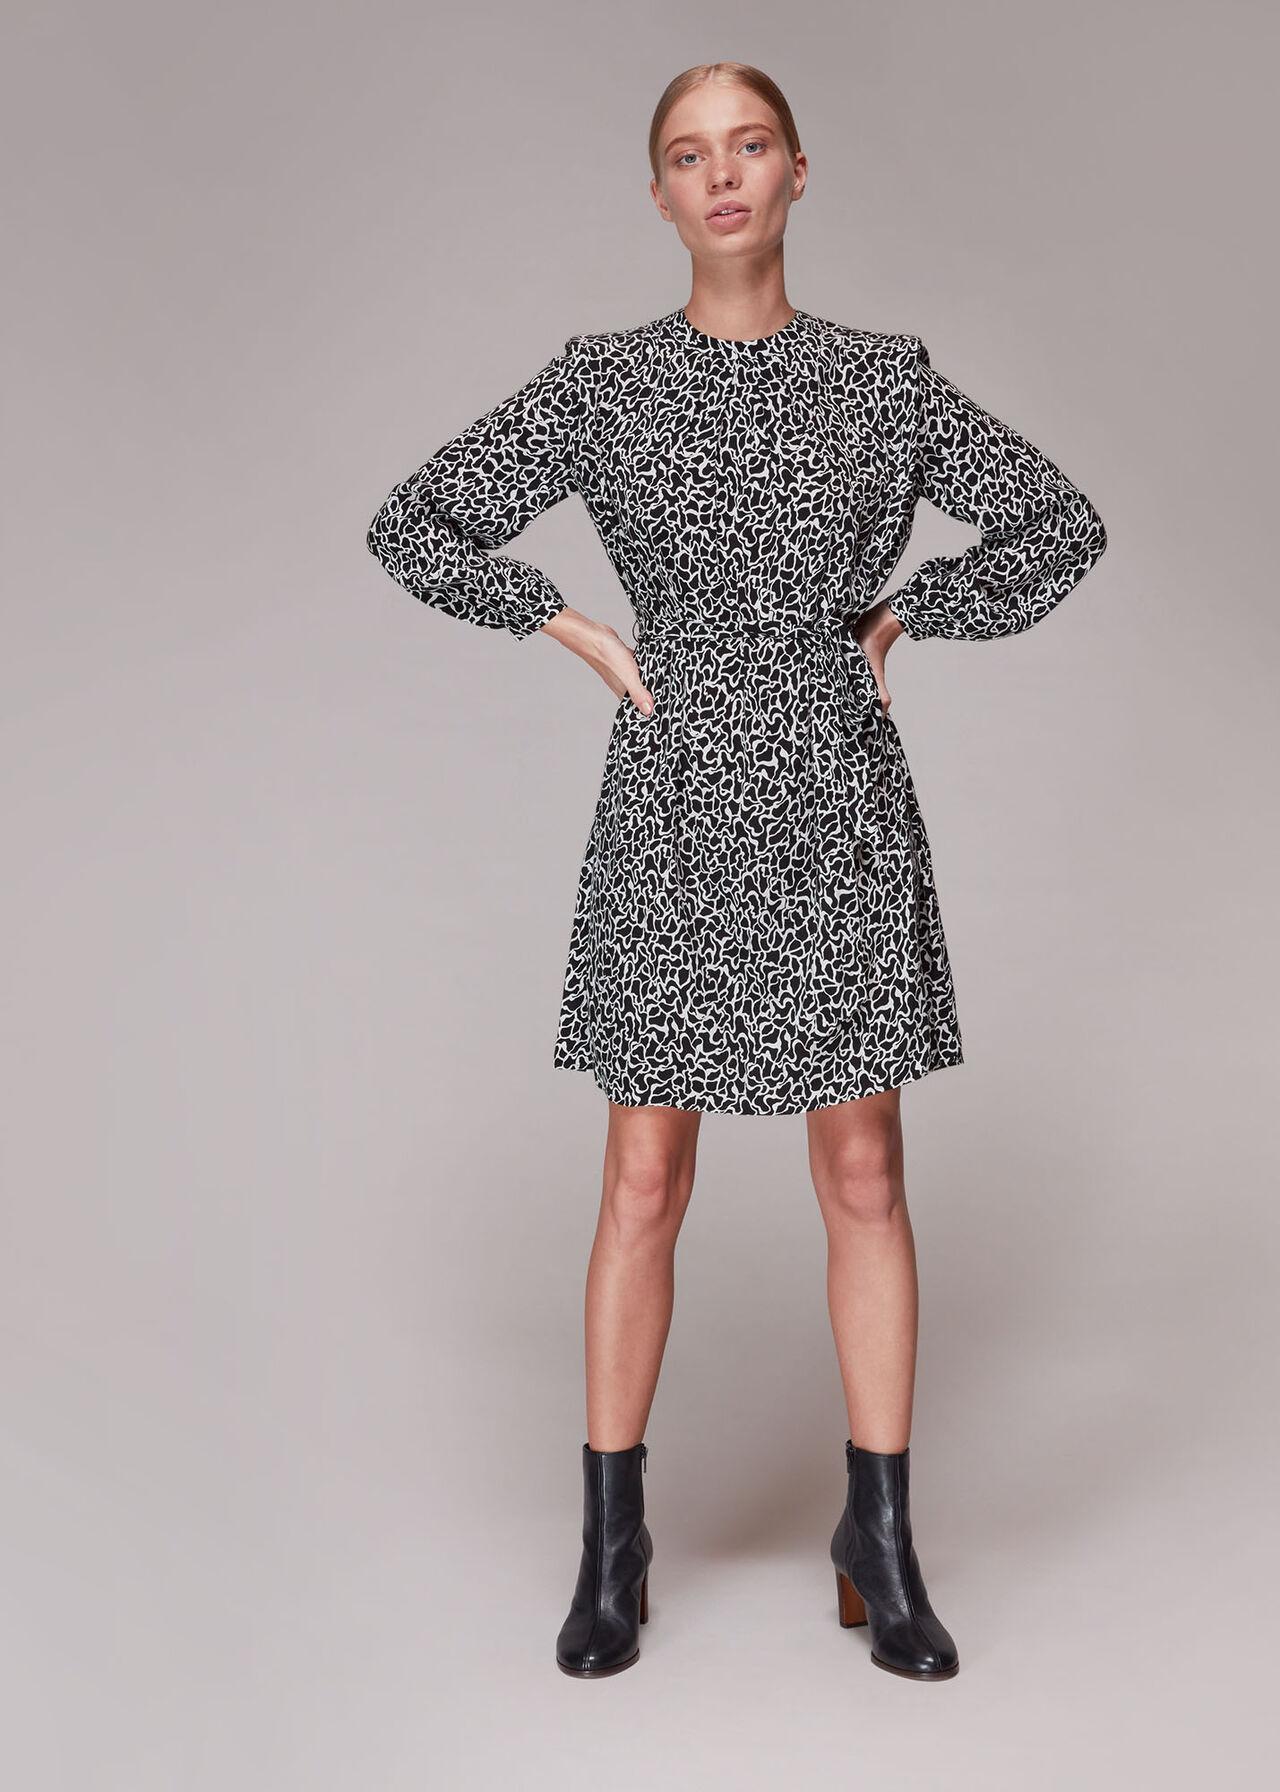 Swirl Print Belted Dress